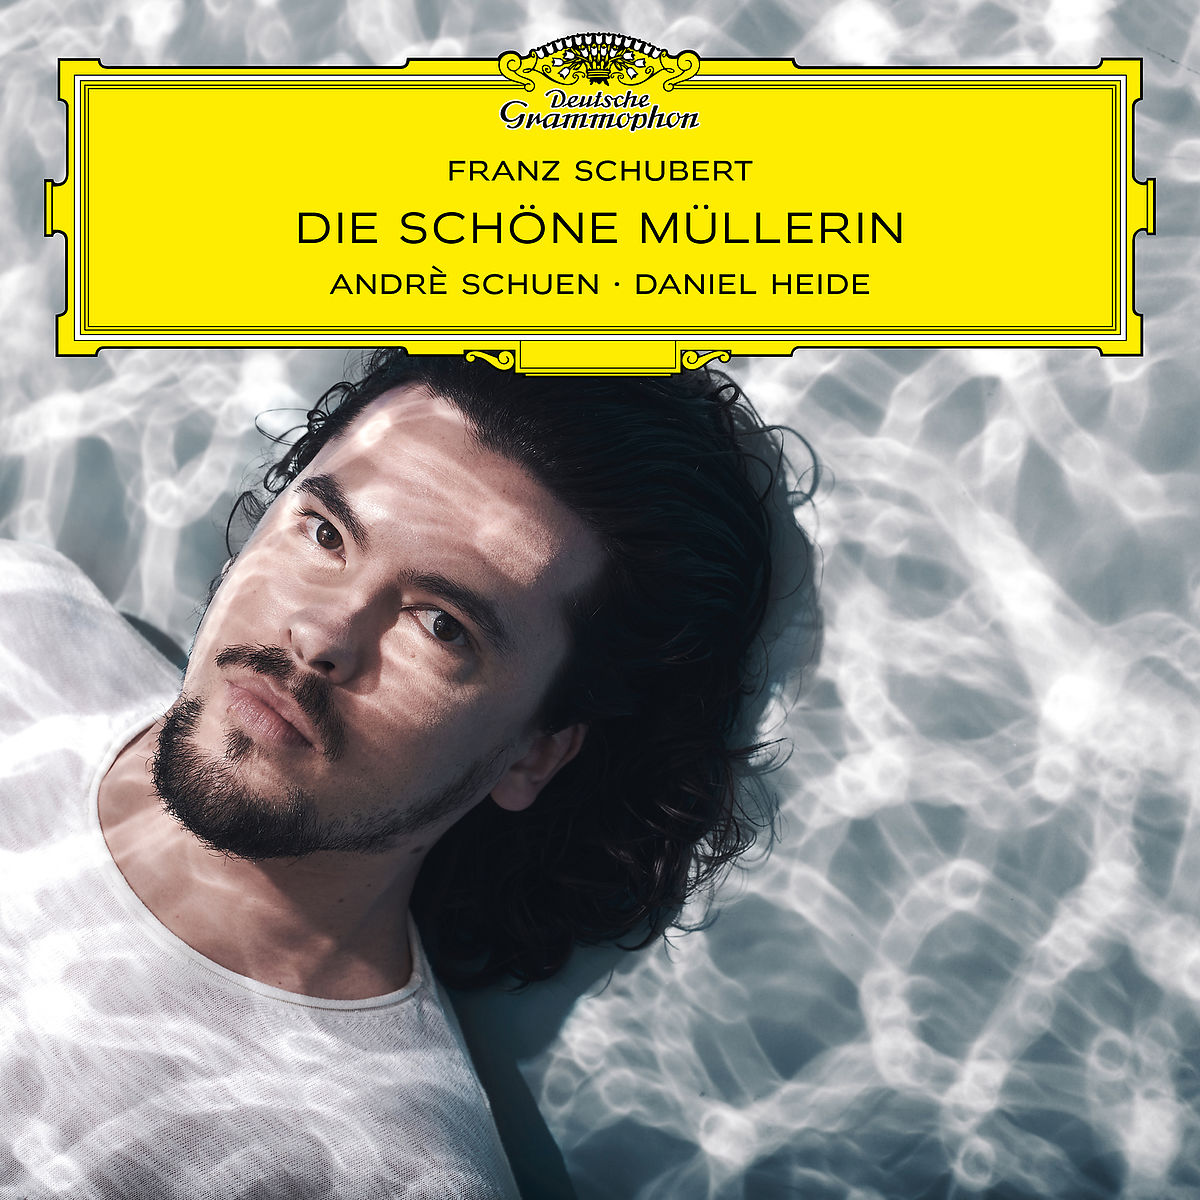 schubert-die-schne-mllerin-op-25-d-795.jpg